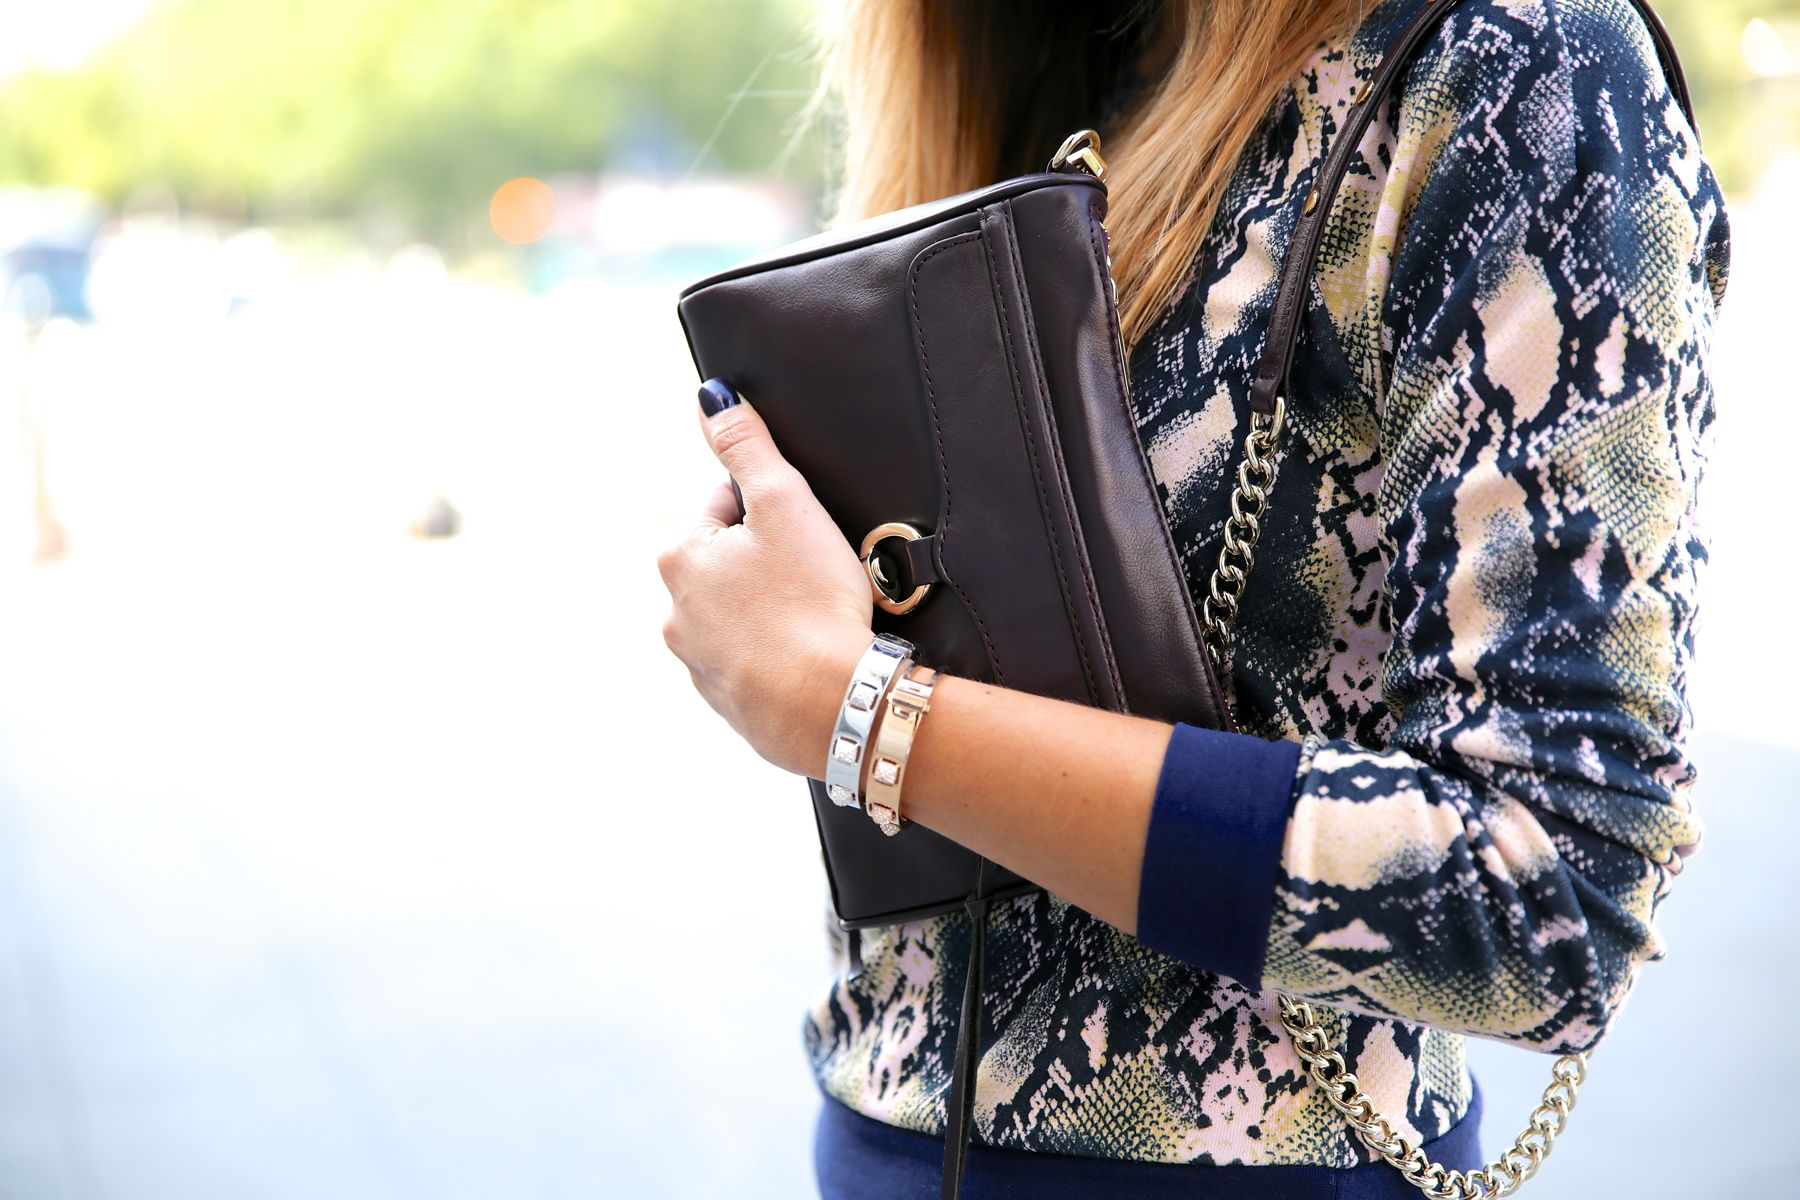 trendy_taste-look-outfit-street_style-ootd-blog-blogger-fashion_spain-moda_españa-girissima.com-sweatshirt-sudadera-estampado-crocodile-cocodrilo-botines-booties-pink_skirt-falda_rosa-2